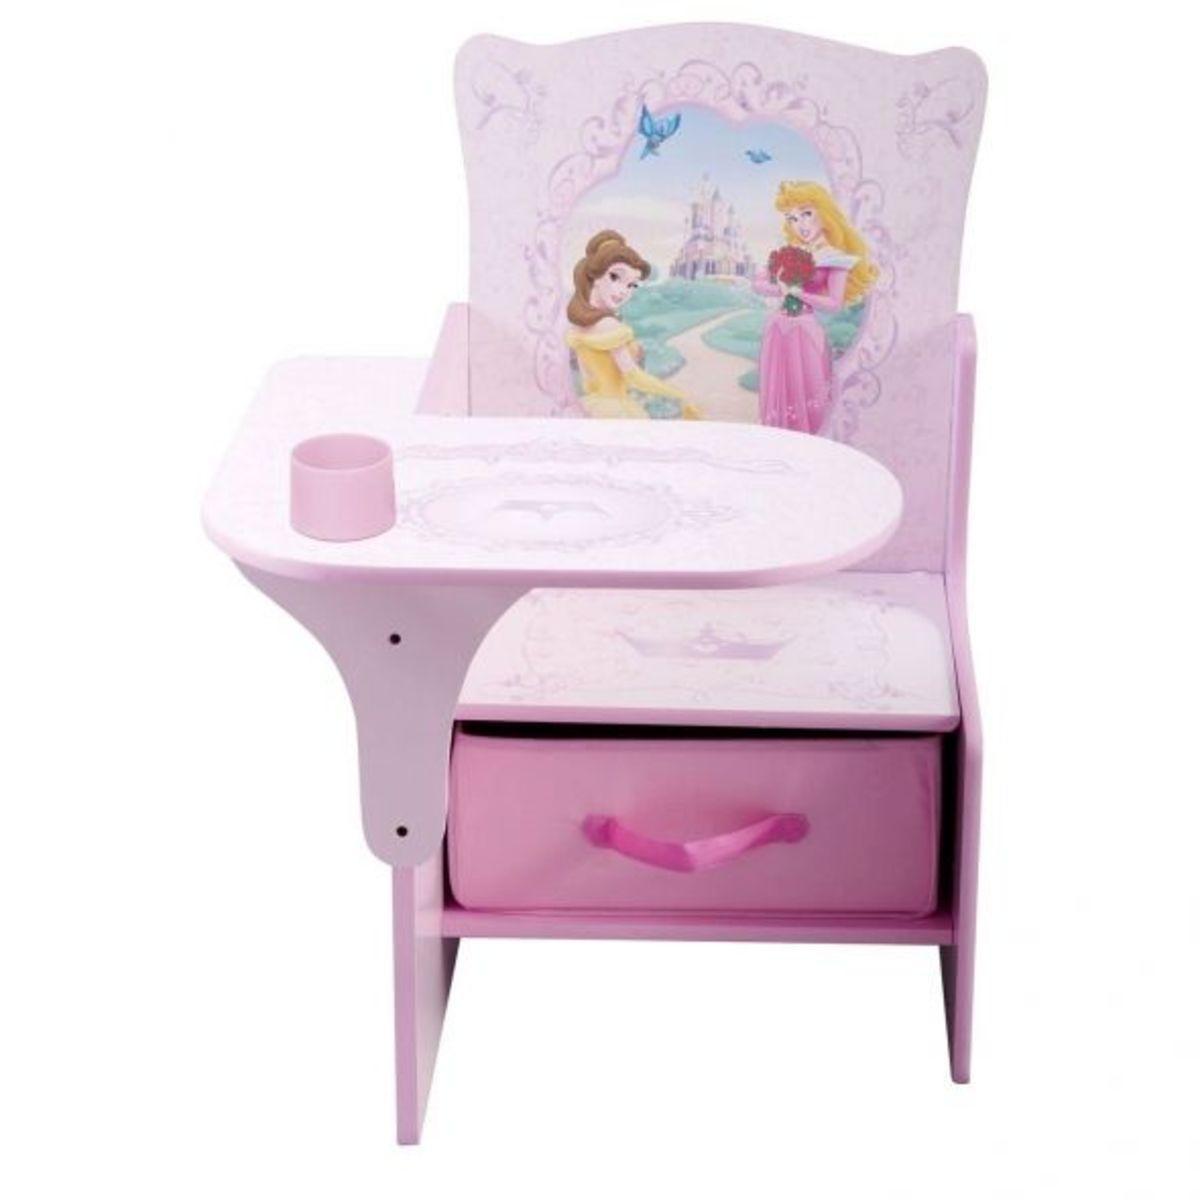 Pink Wooden Princess Children's Chair